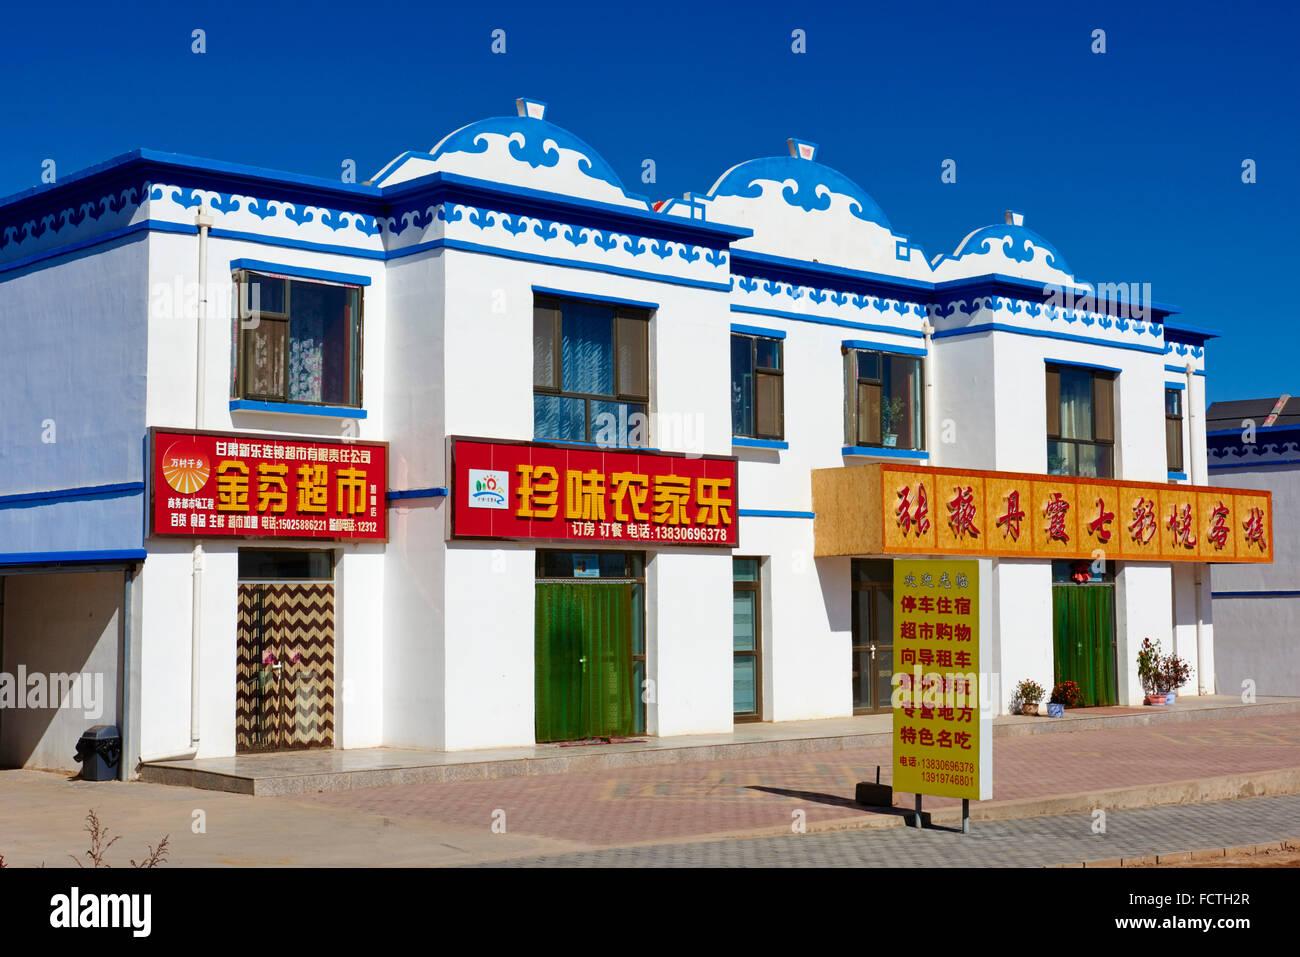 Cina, provincia di Gansu, Zhangye, mongola architettura di stile Immagini Stock